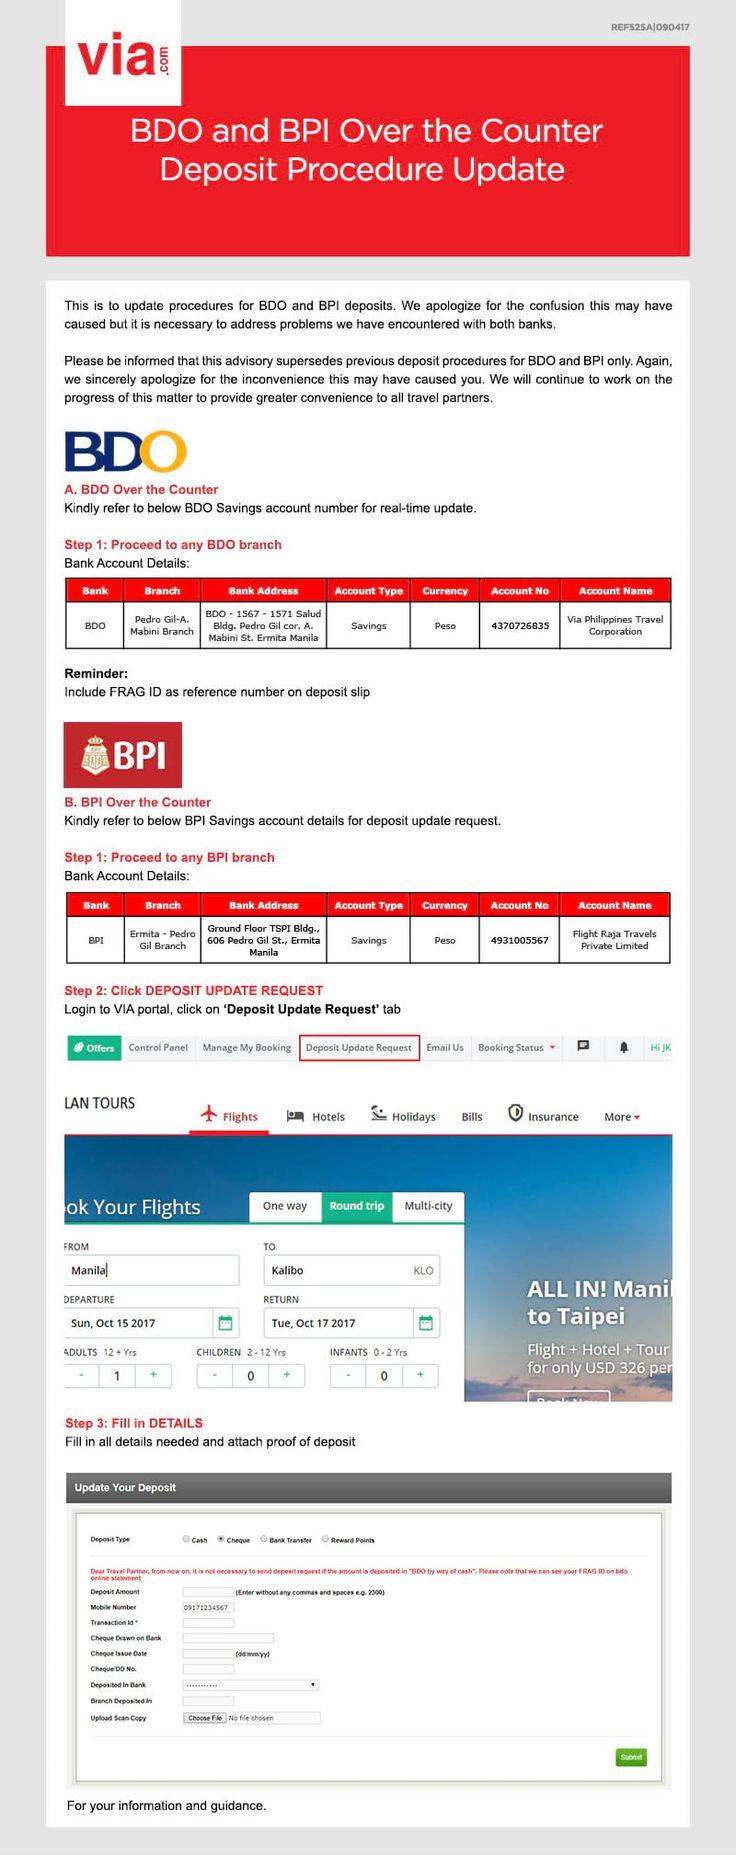 1504513623196_BDO_and_BPI_Over_the_Counter_Deposit_Procedure_Update.jpg (800×2017)